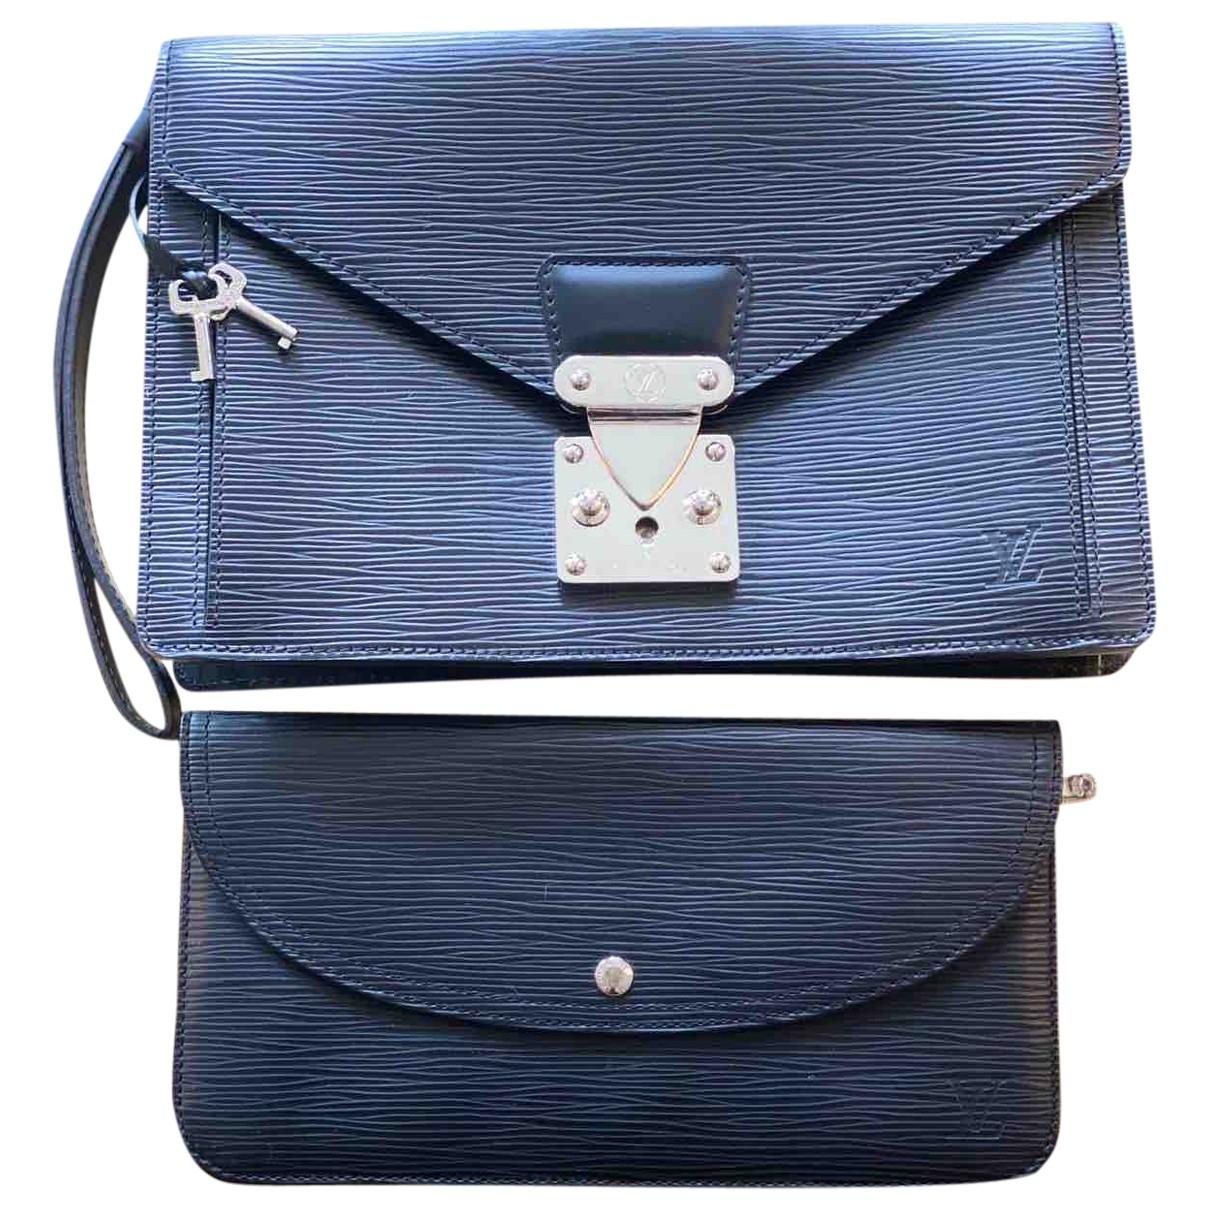 Louis Vuitton Metis Black Leather Clutch bag for Women \N